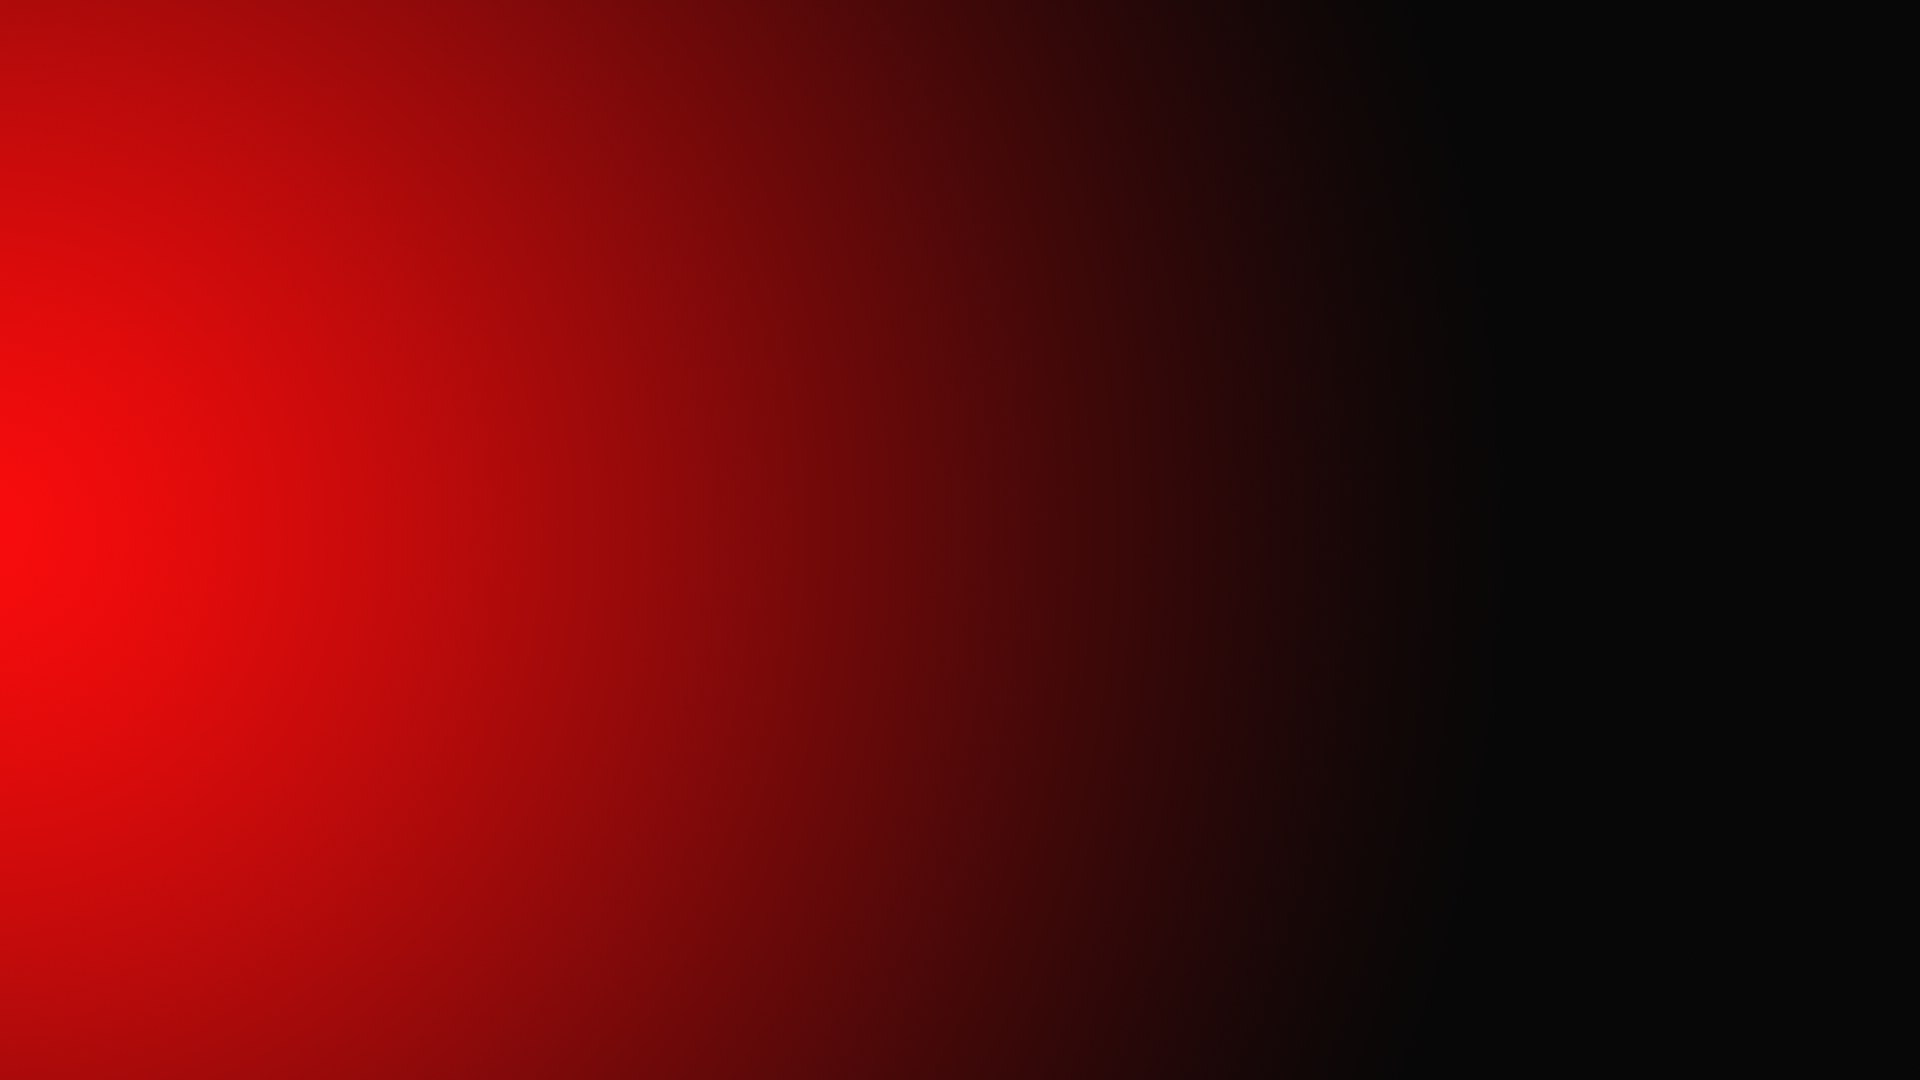 Red And Black Background 21 Desktop Background. Zebra Desk Accessories. Twin Size Loft Bed With Desk. Folding Poker Tables. Cross Leg Desk. Roll Top Desk History. Miter Table. Plans For Computer Desk. Mirror End Table